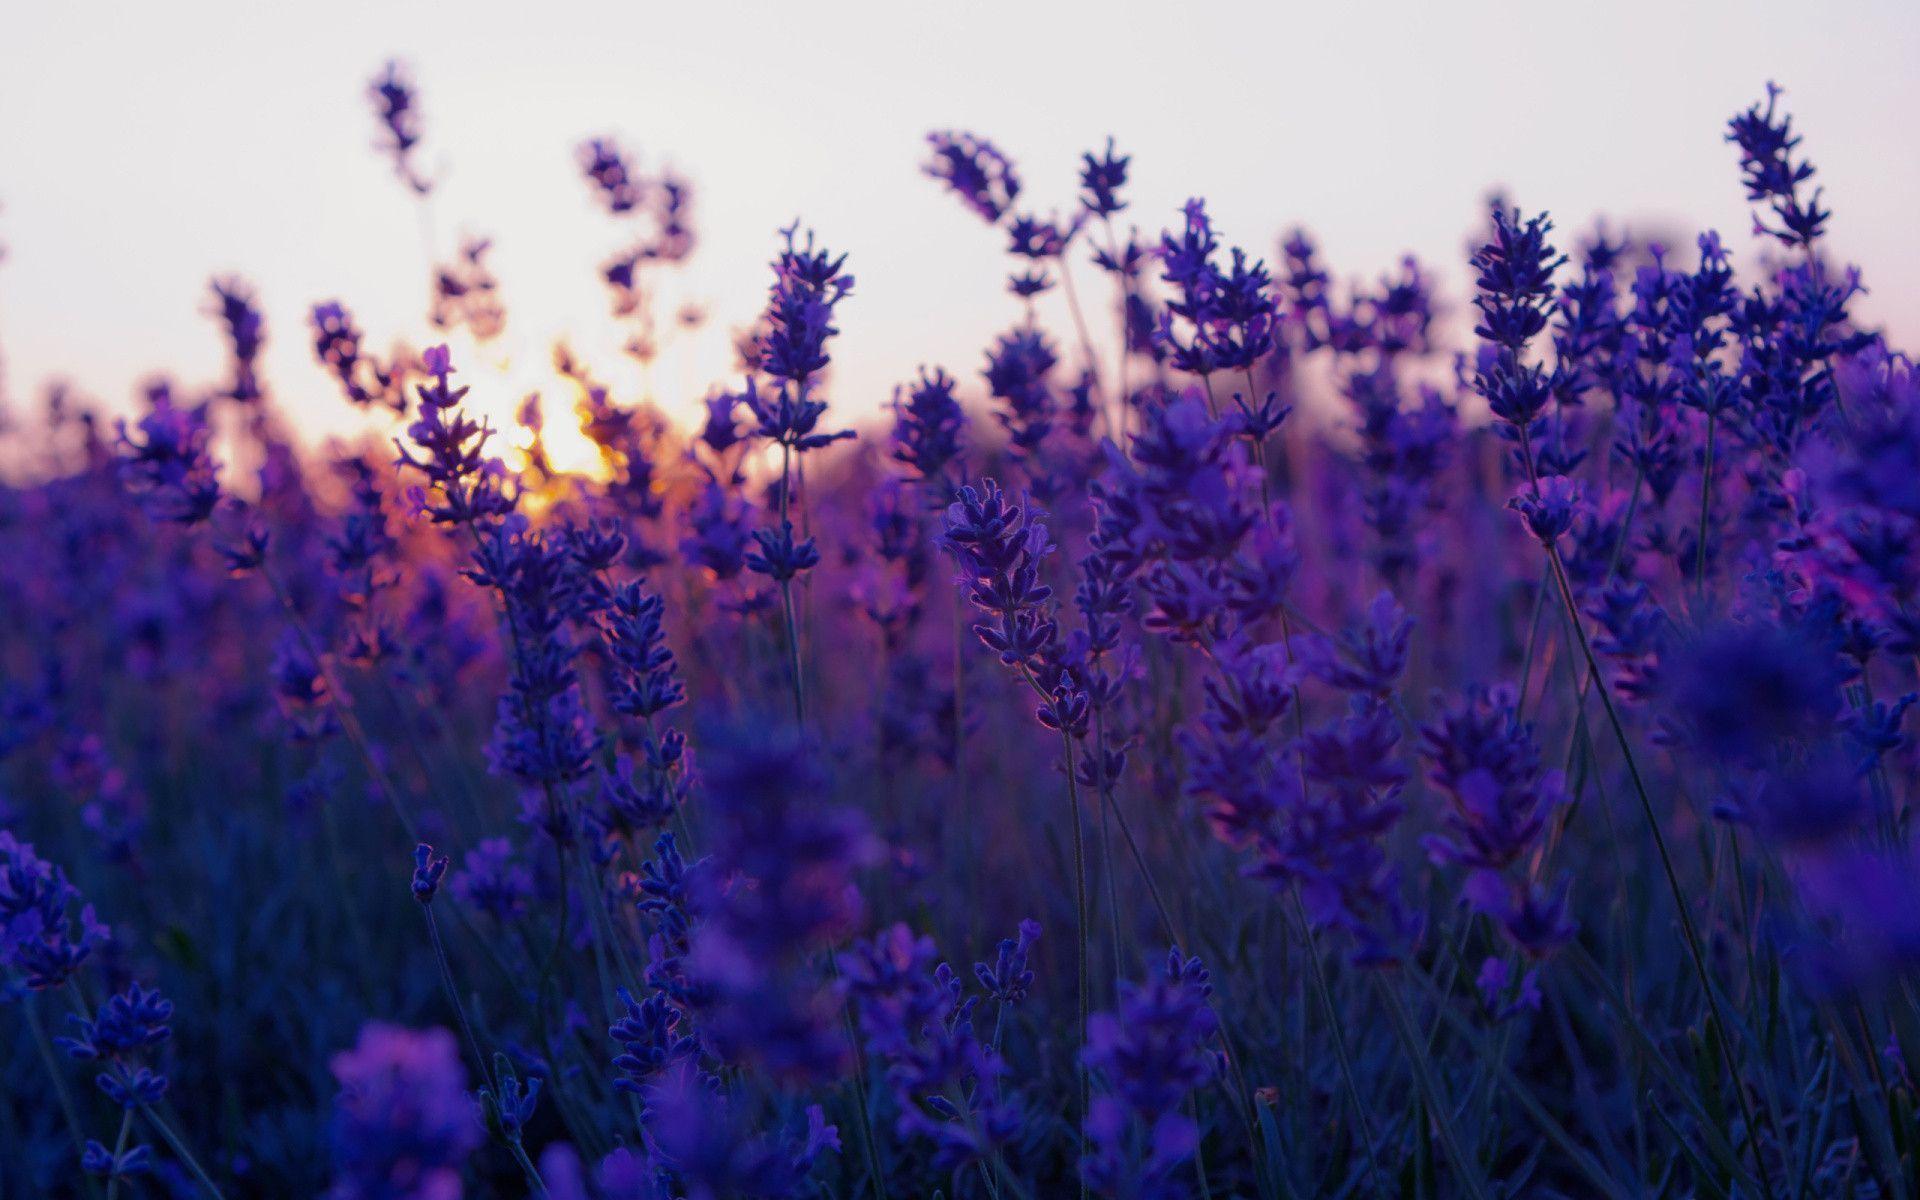 Mehndi Wallpaper Hd Lavender Flower Wallpaper Hd Wallpapers Pulse